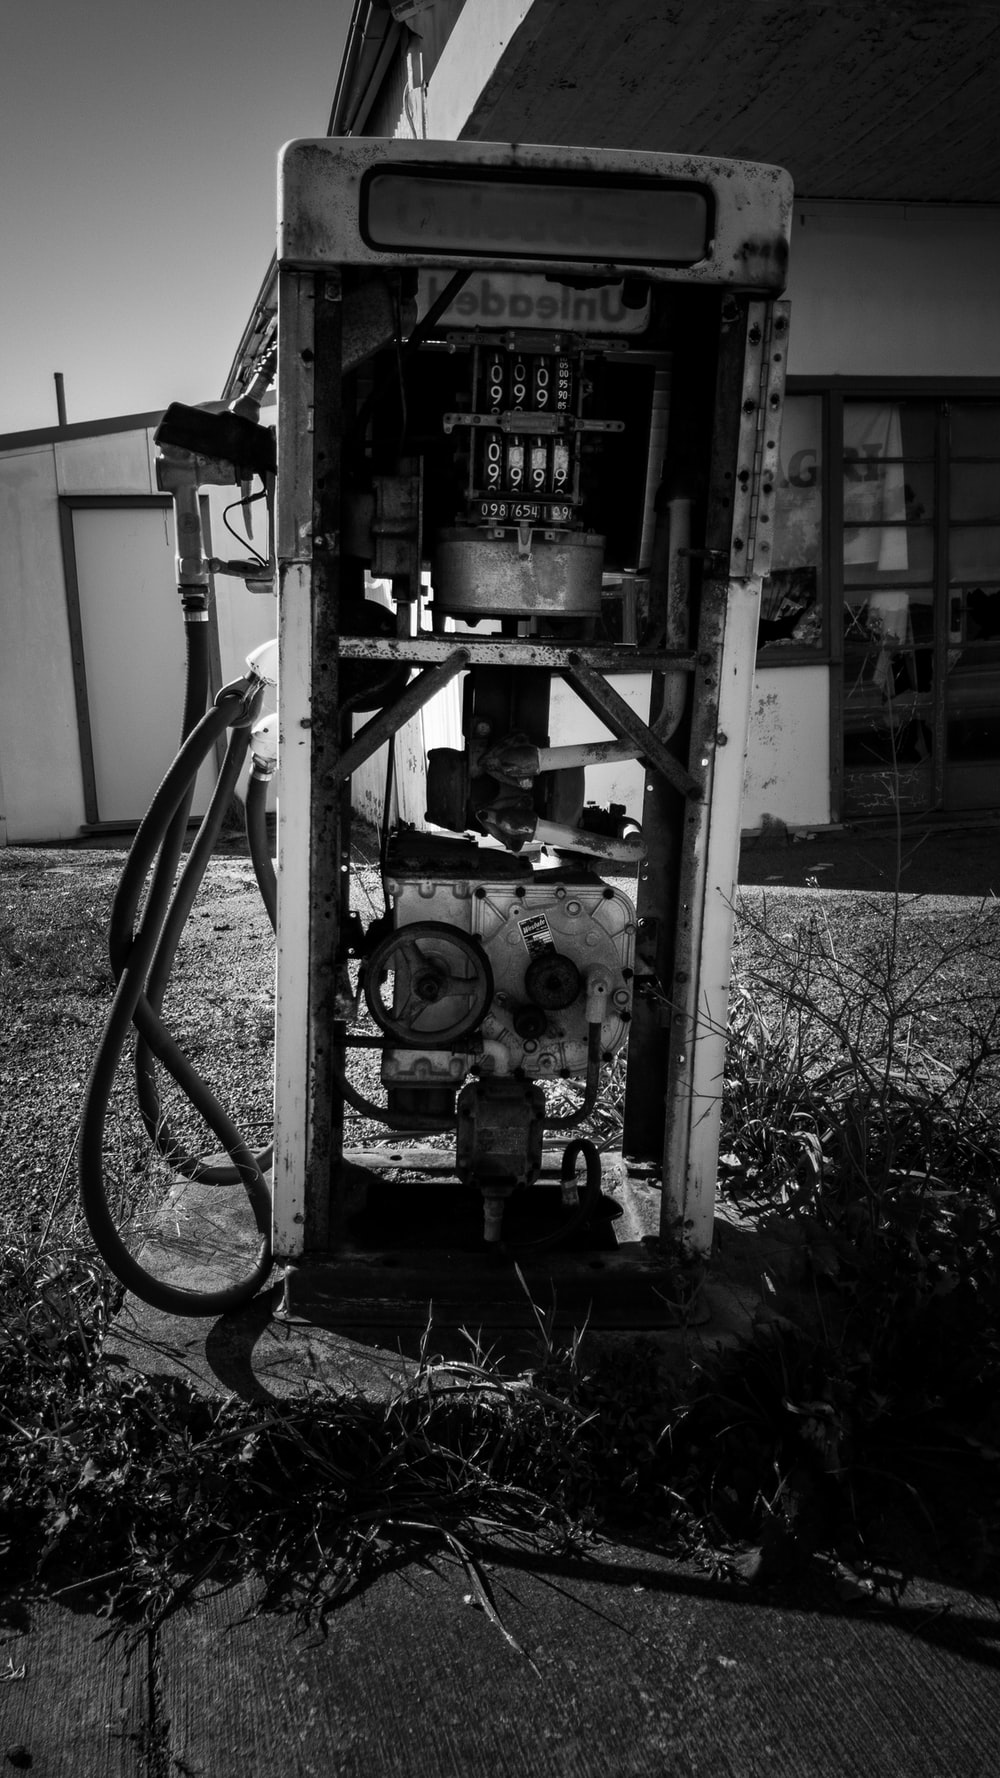 grayscale photo of metal machine